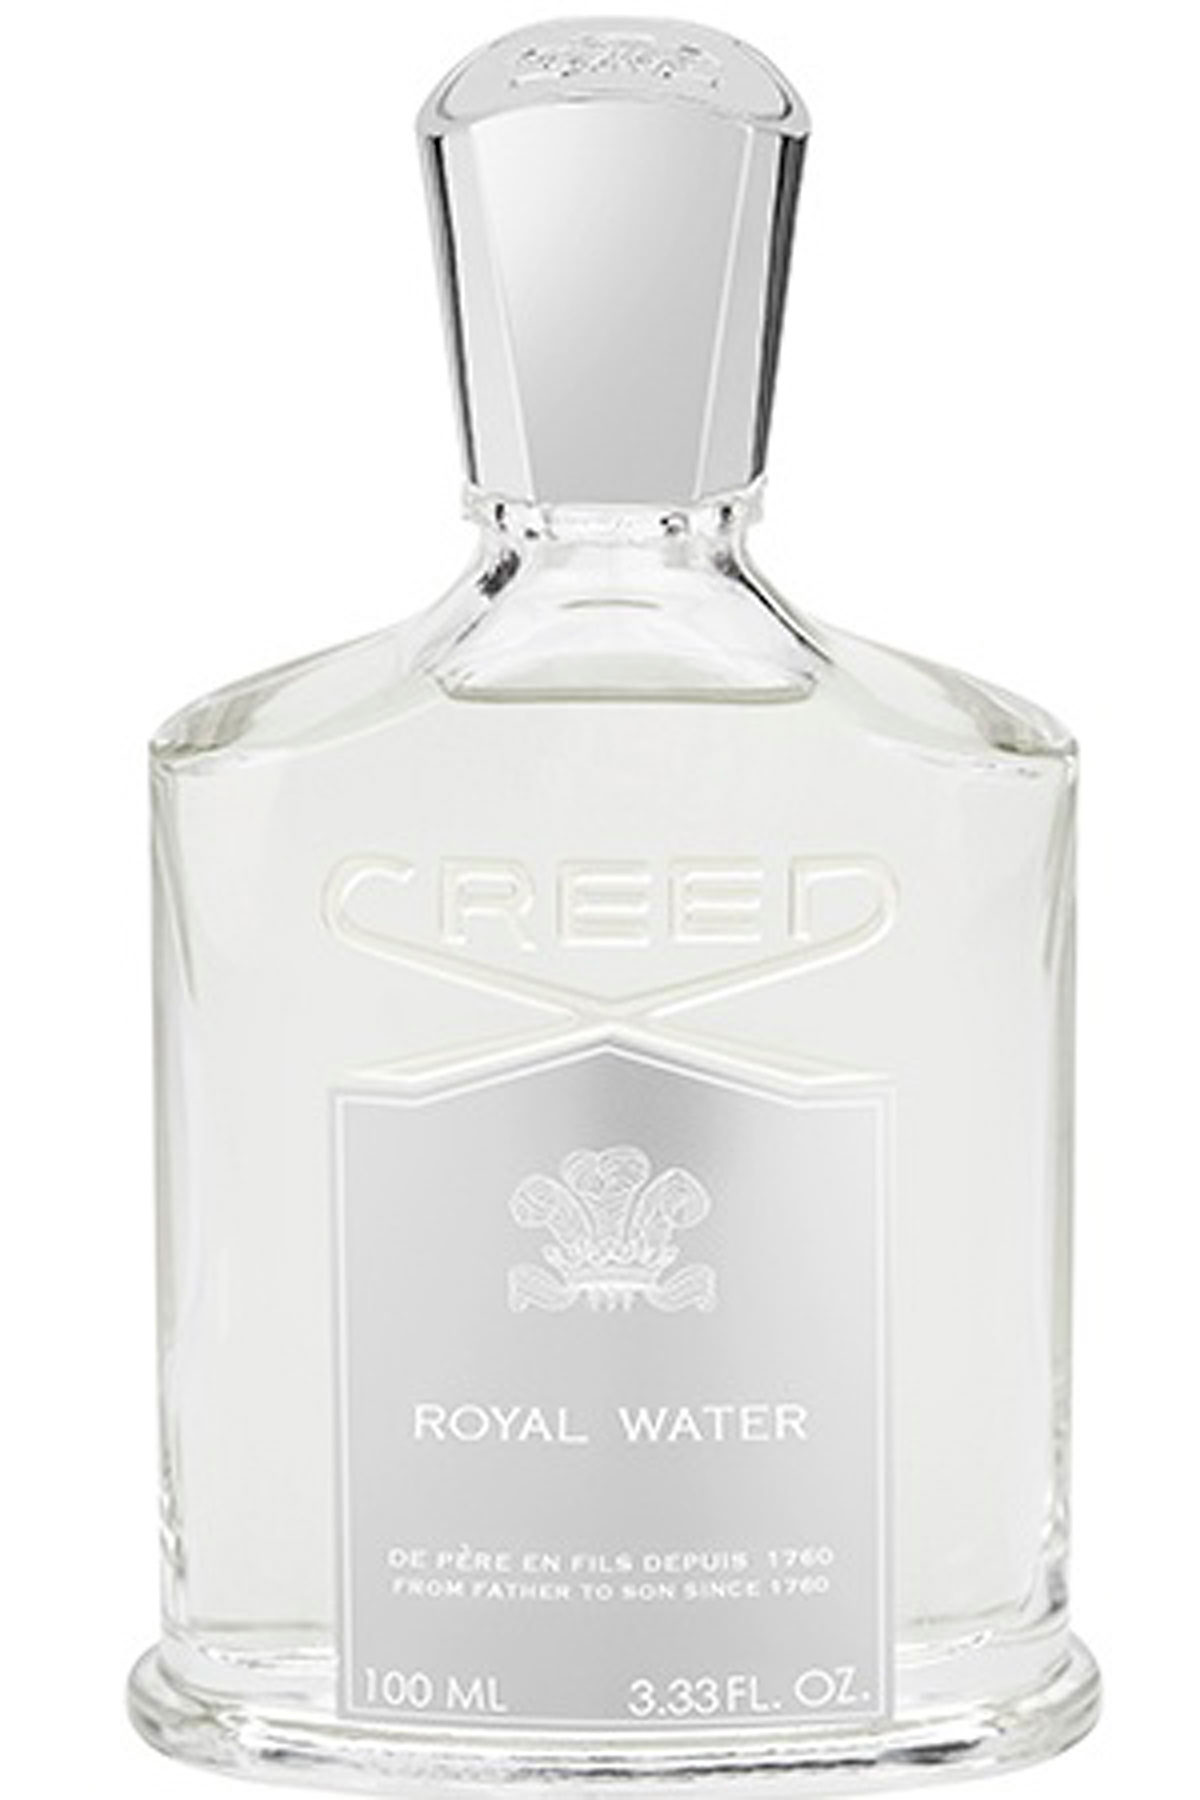 Creed Fragrances for Women, Royal Water - Eau De Parfum - 100 Ml, 2019, 100 ml